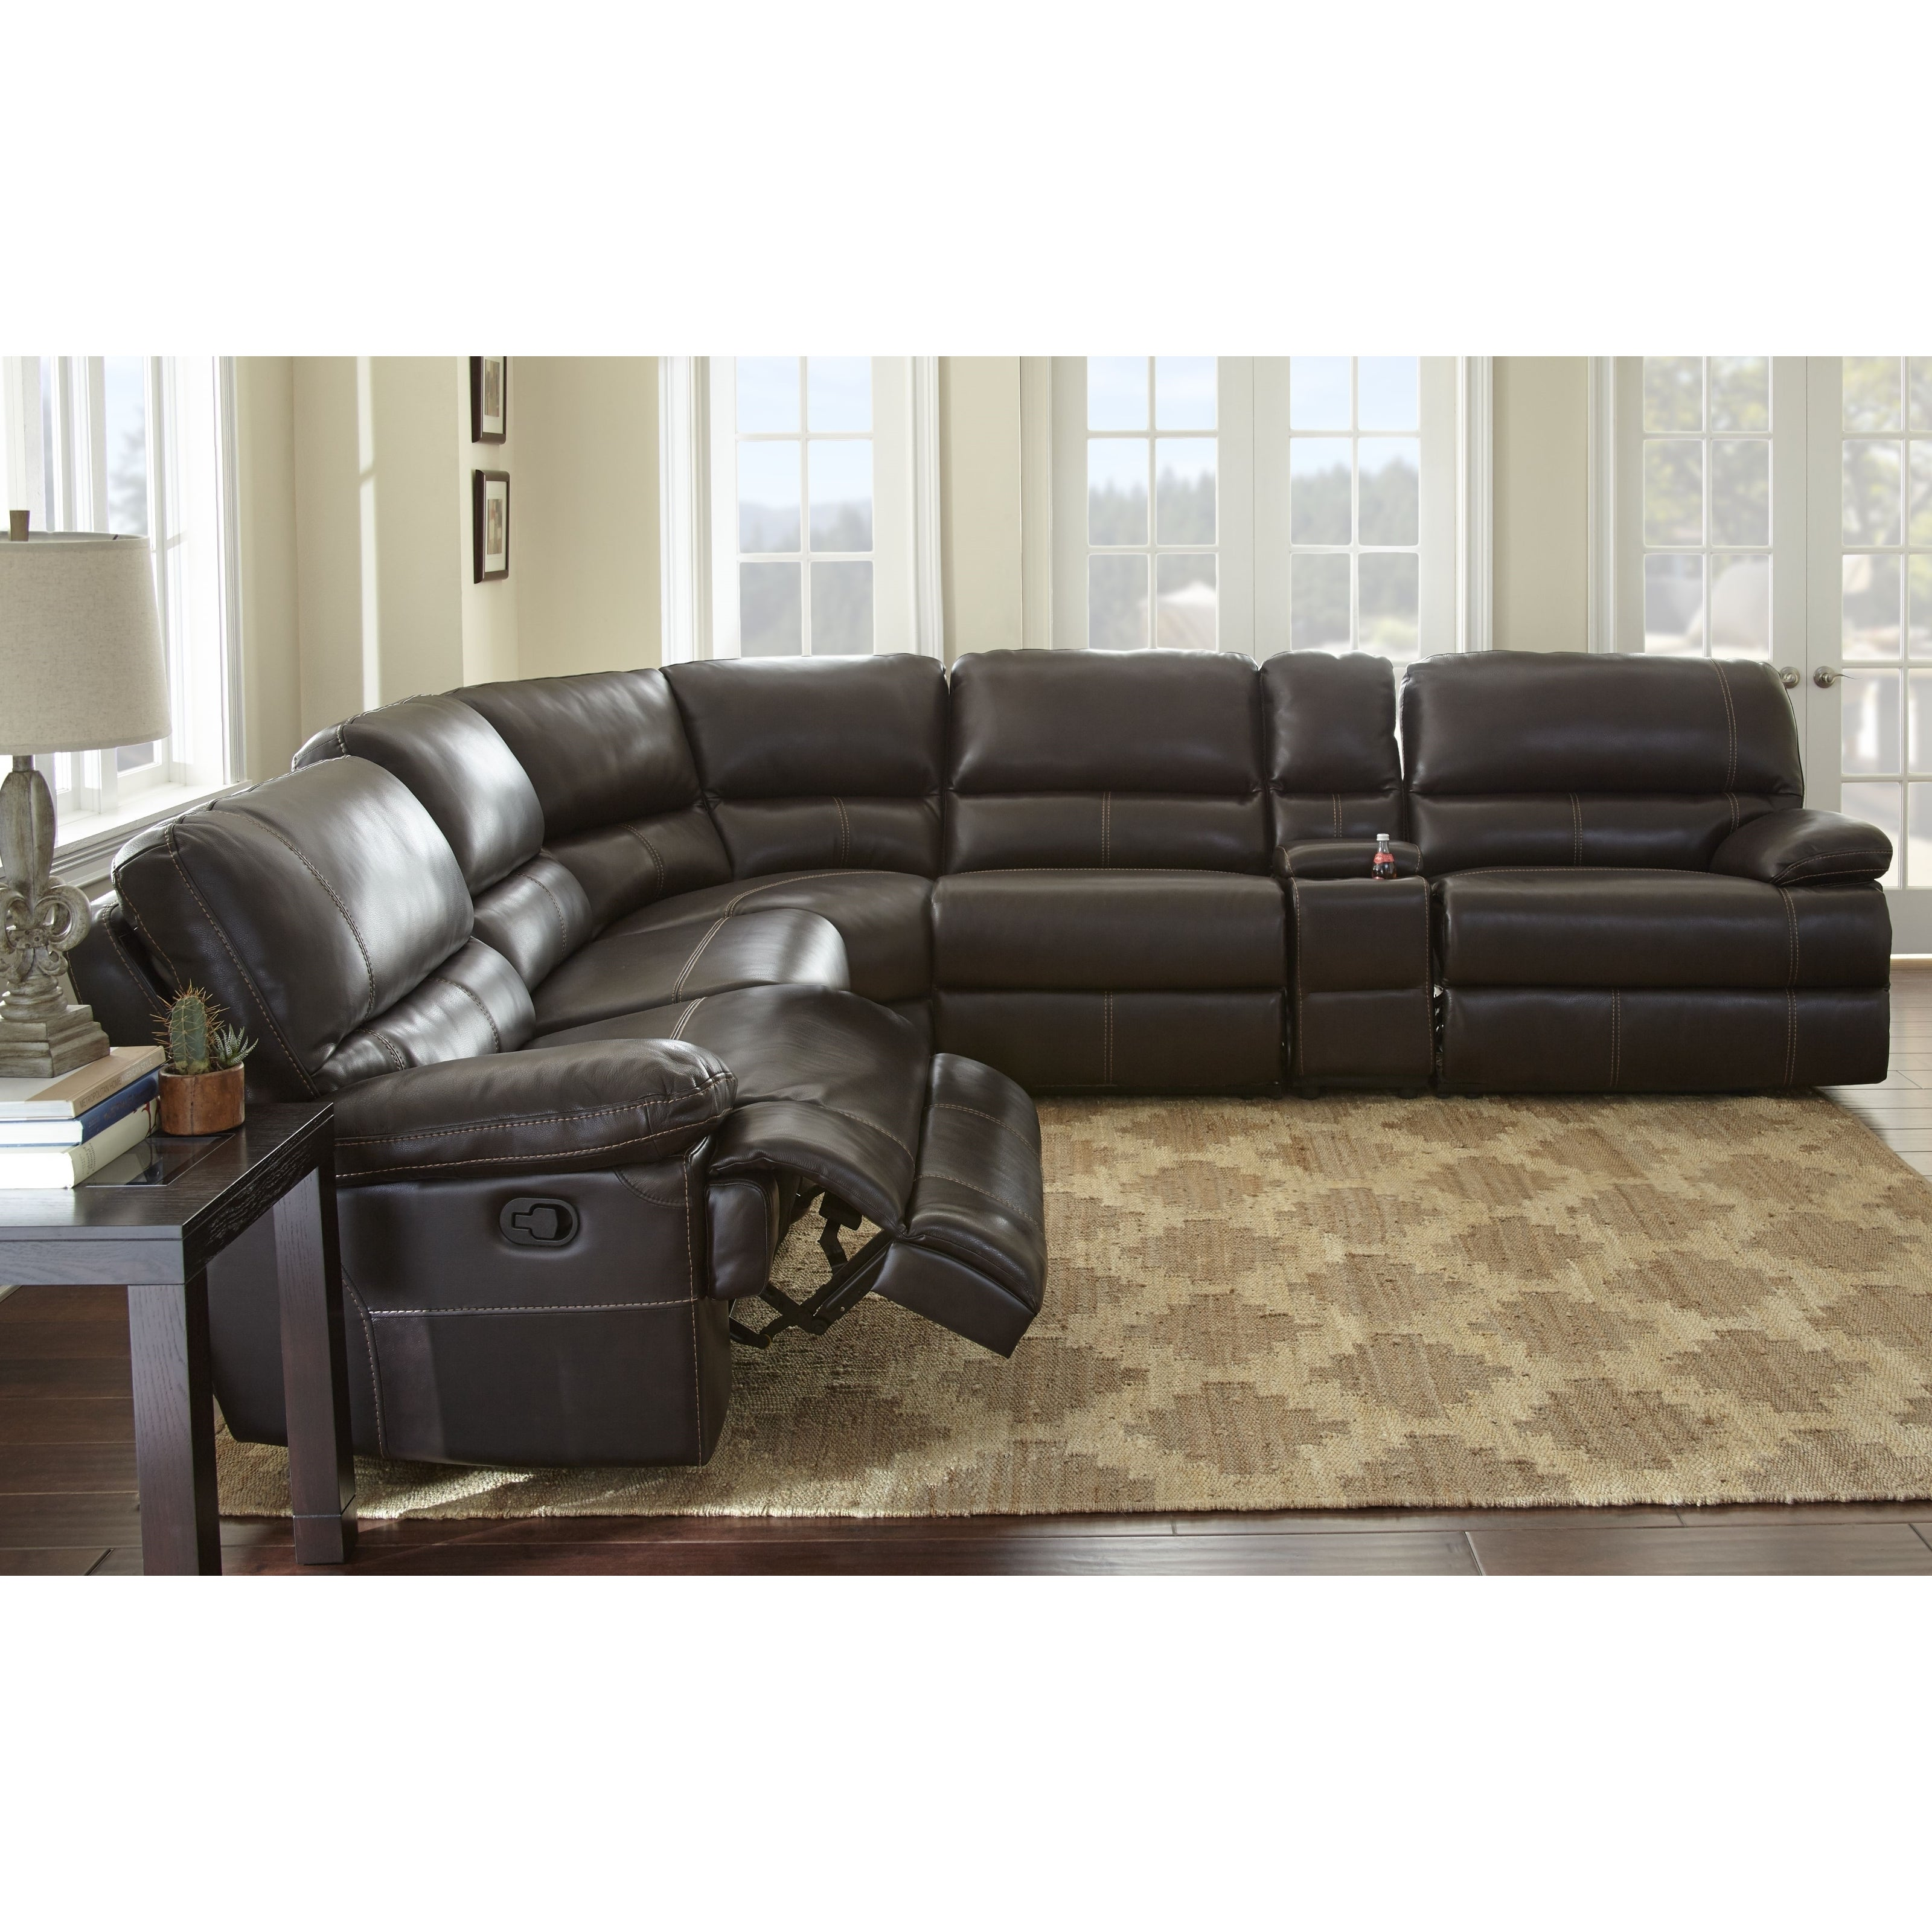 Ashley Furniture Midlothian Va: Rimini Sofa Rimini Top Grain Leather Sectional Sofa By